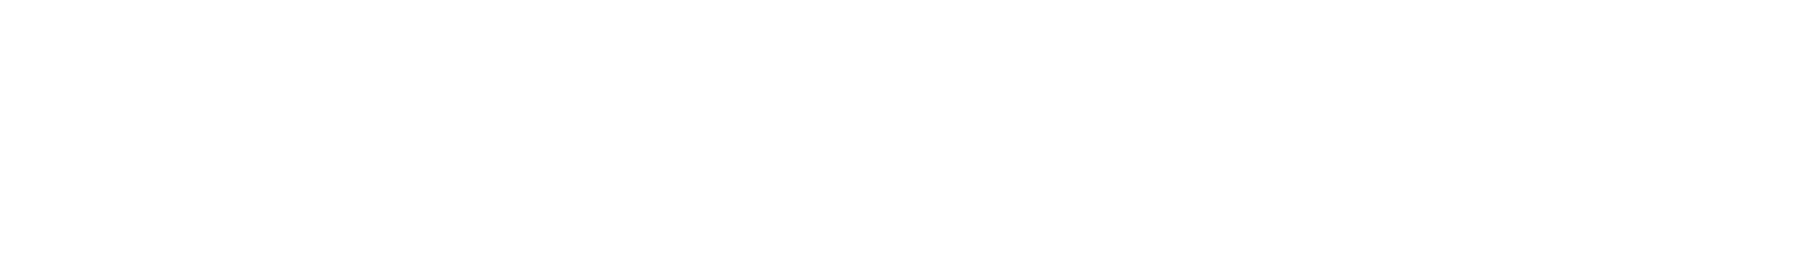 36 synth loop f